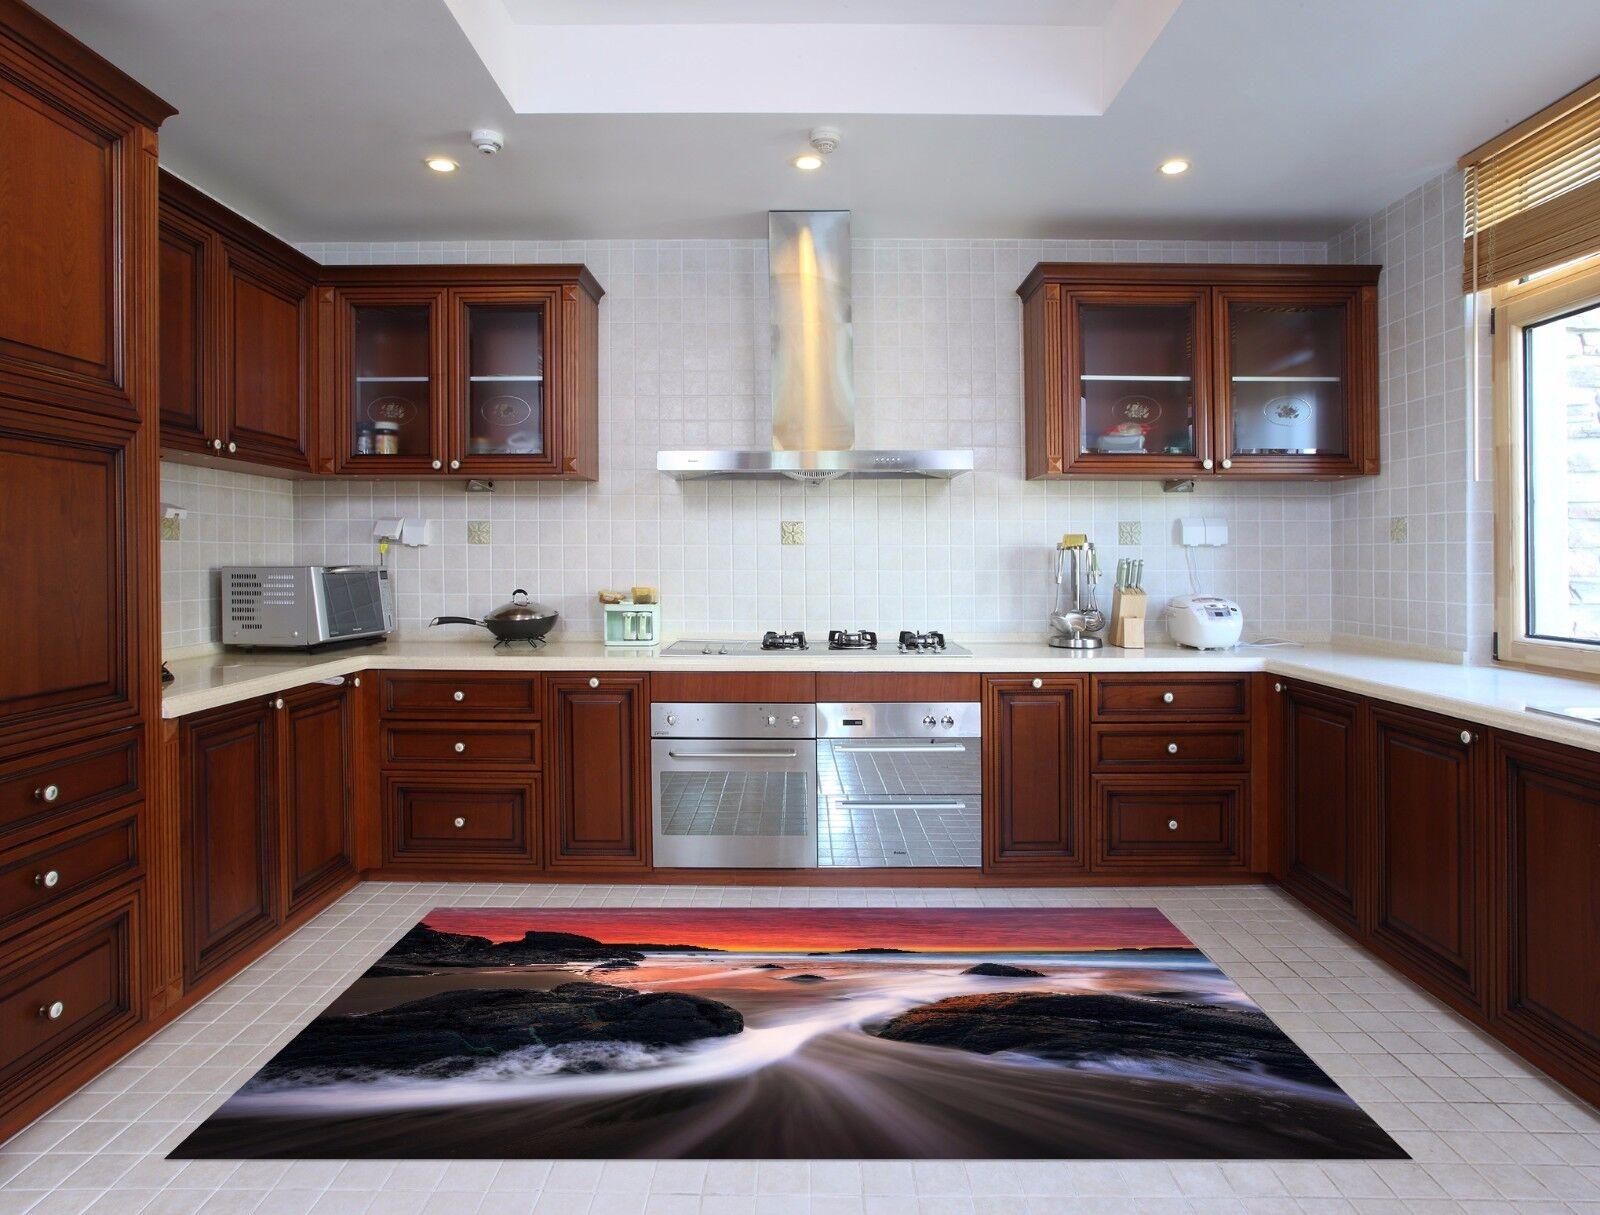 3D Torrents 727 Kitchen Mat Floor Murals Wall Print Wall AJ WALLPAPER AU Kyra